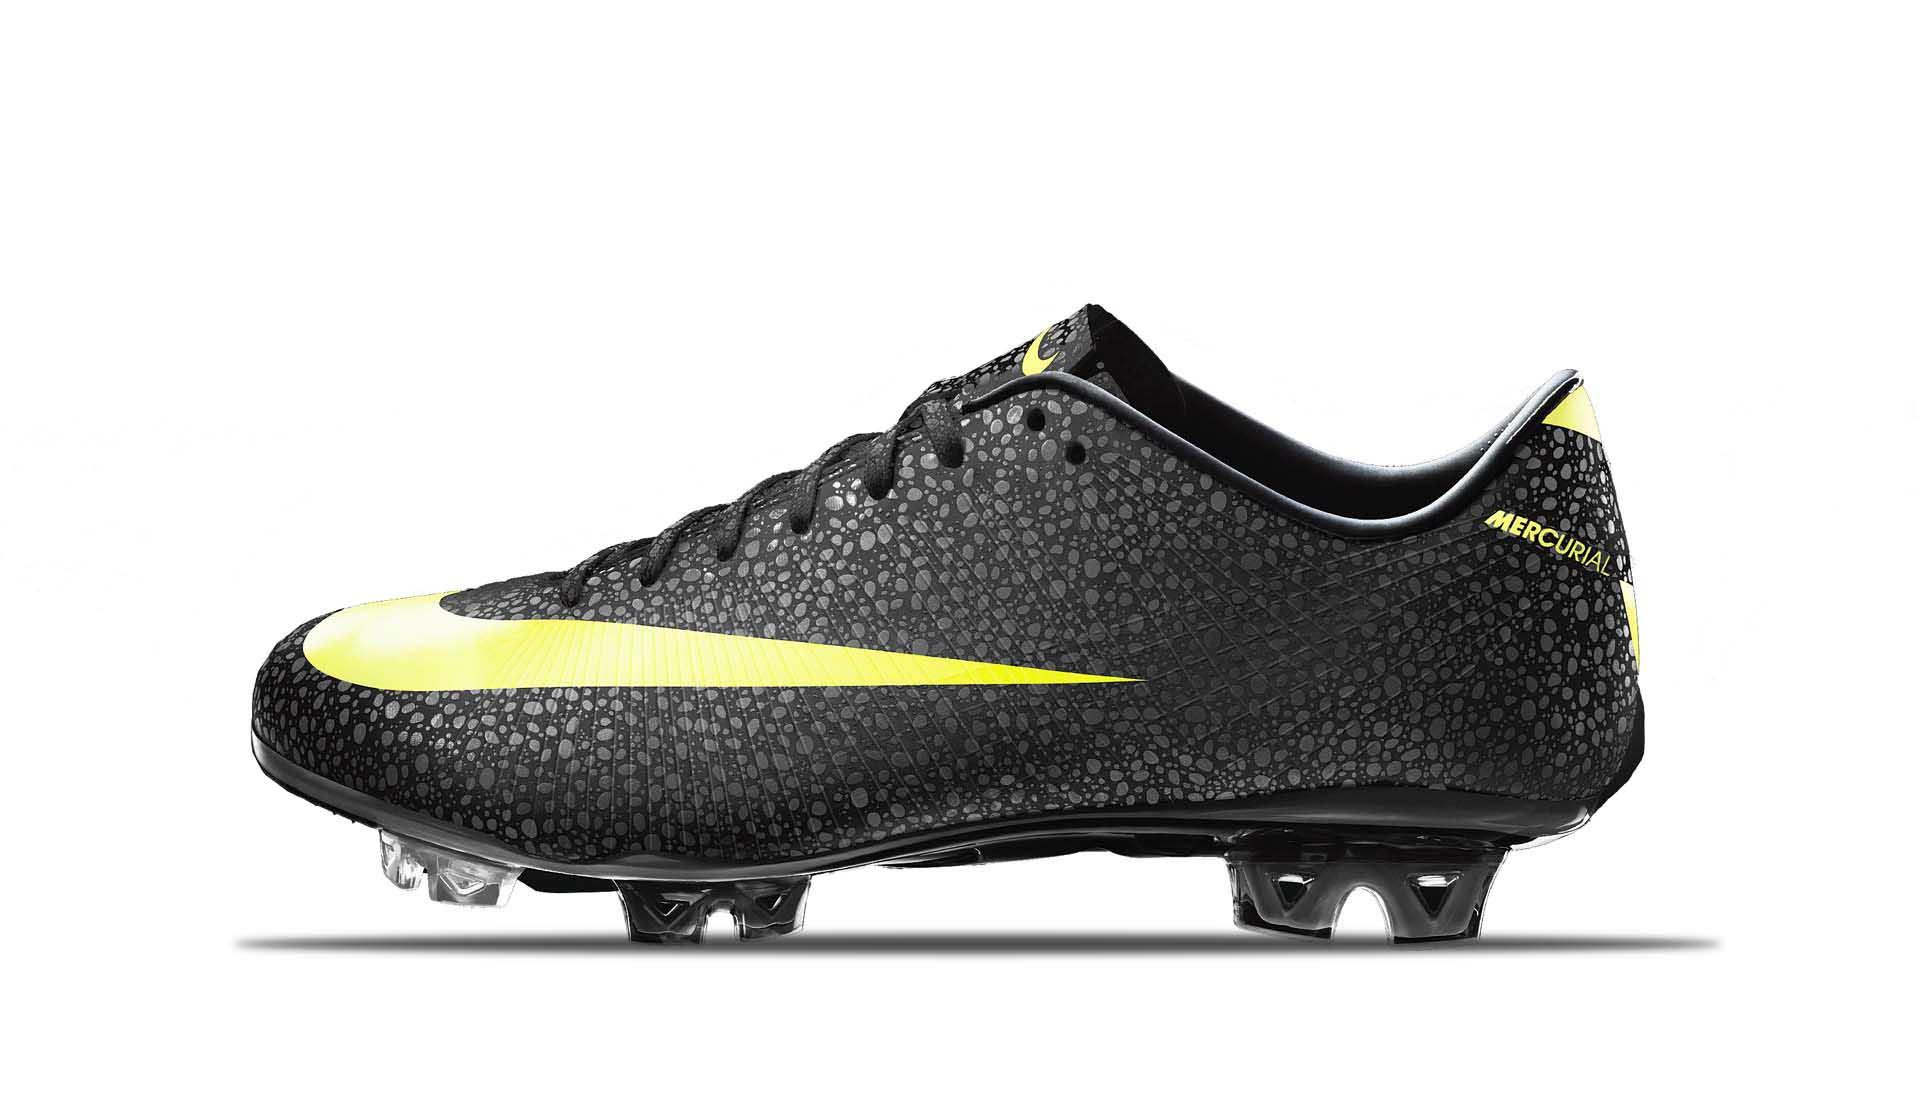 Giày đá banh Nike CR Mercurial Superfly III 'Safari Black'